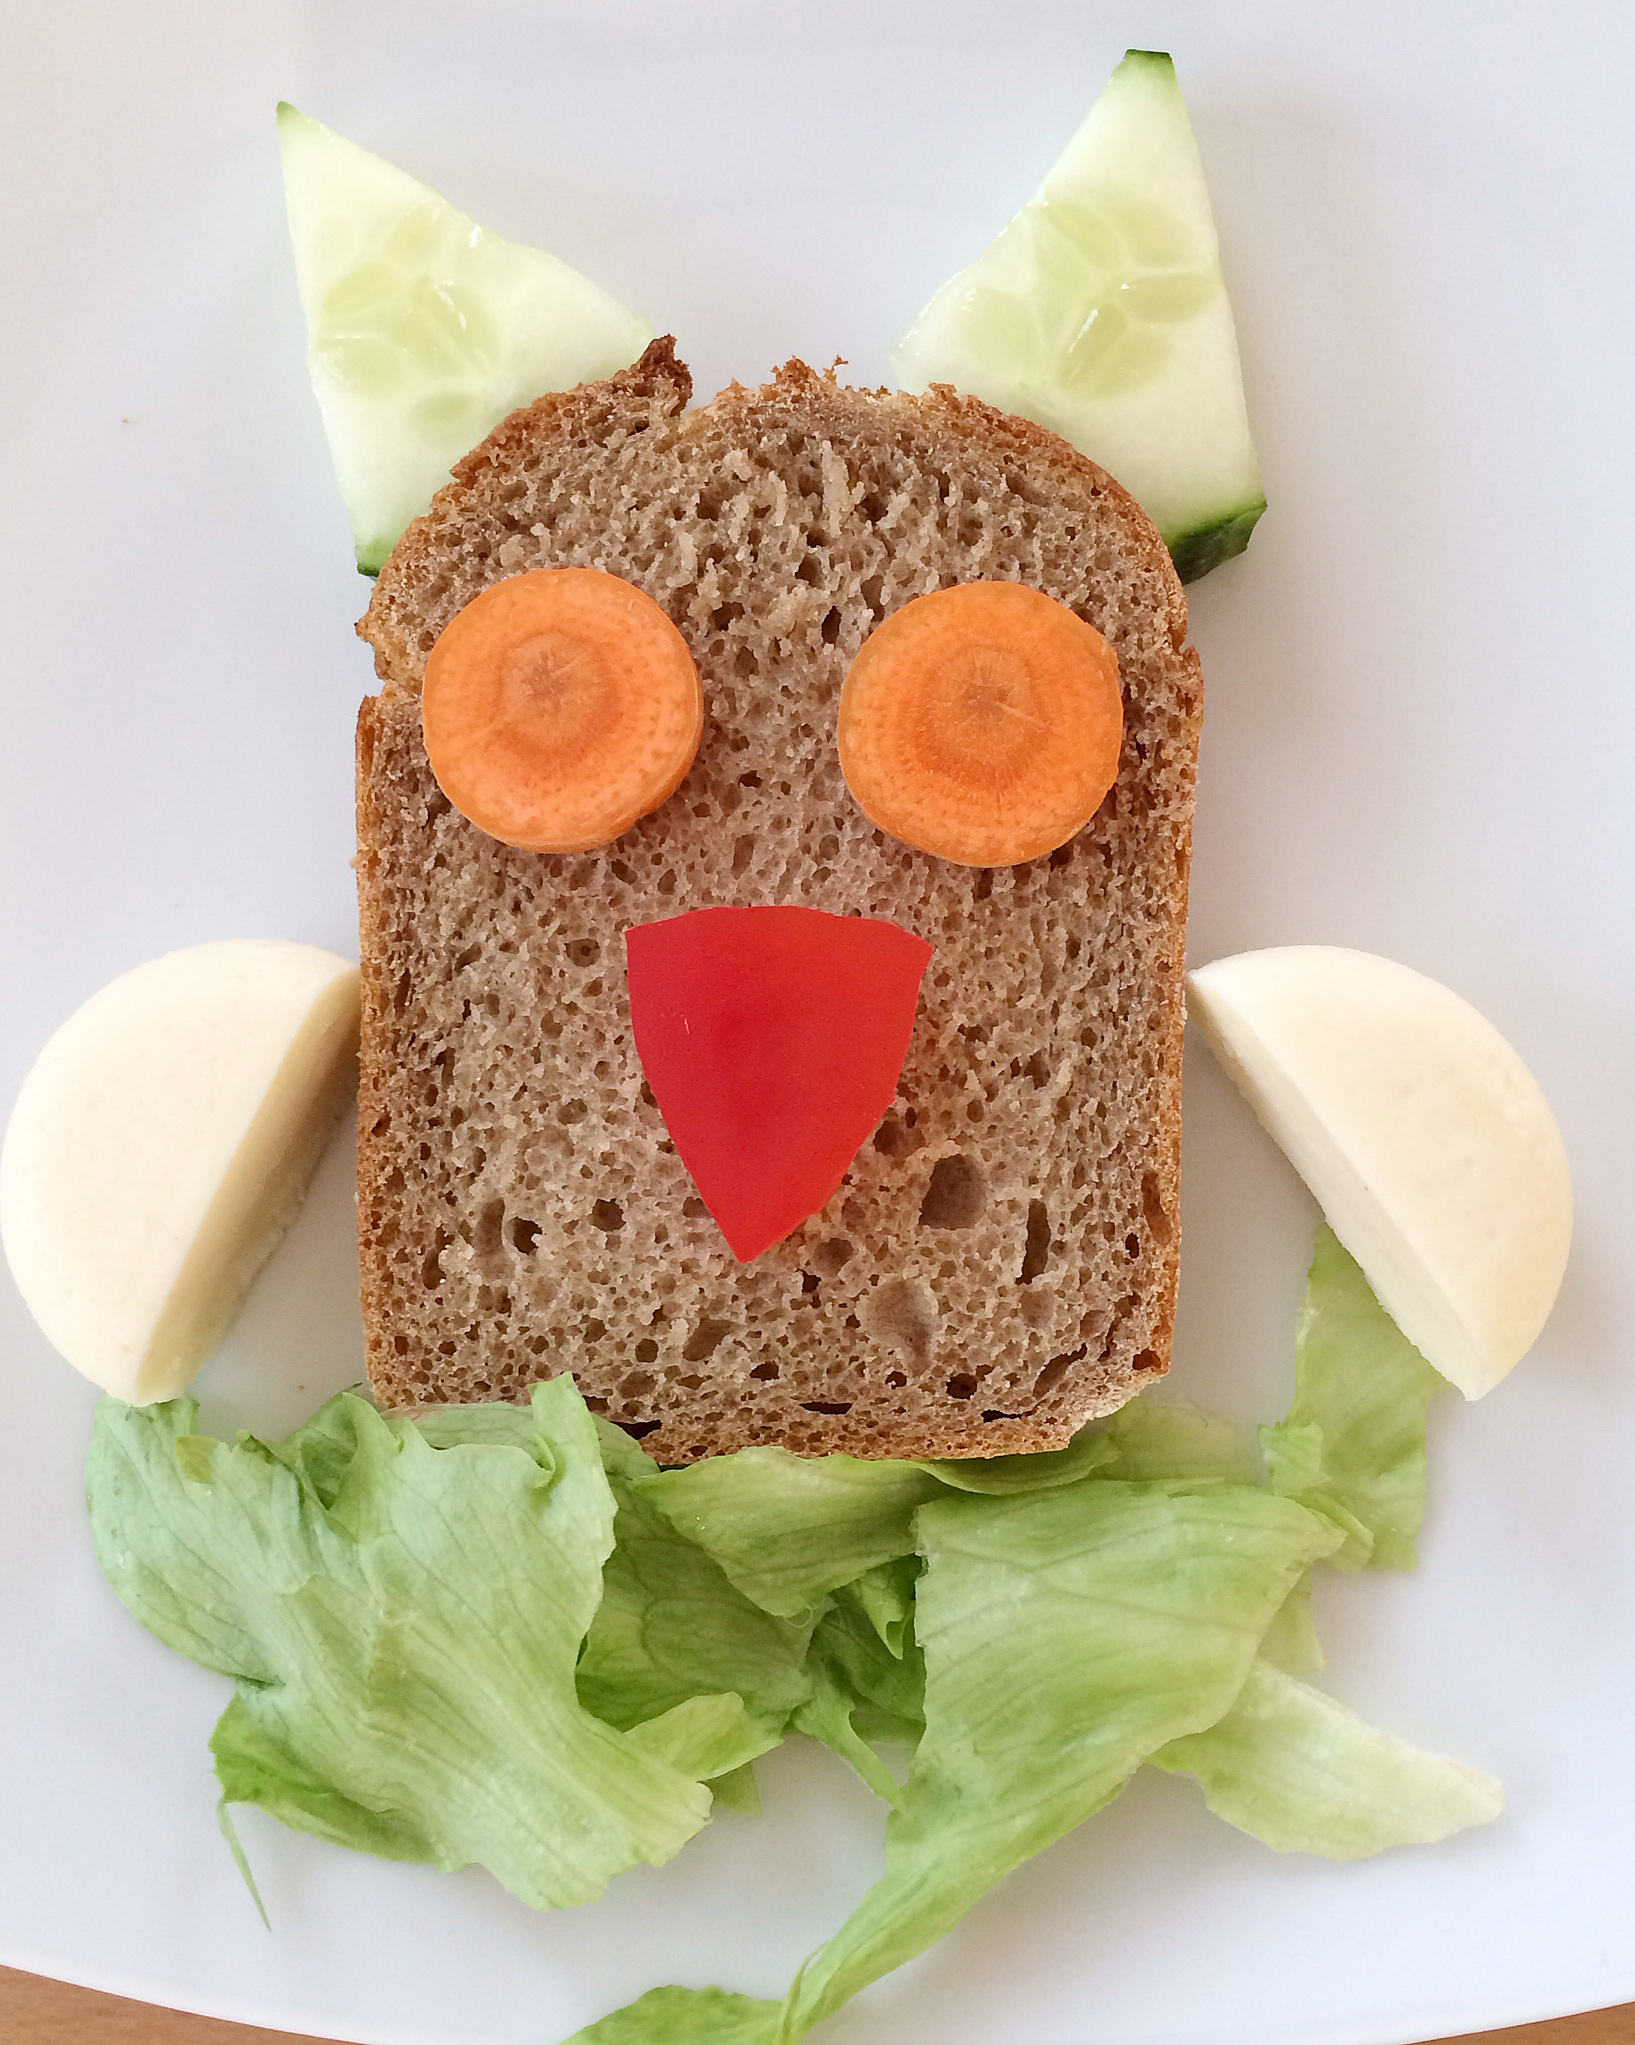 Schnell gemachte Eule. Aus Brot, Salatgurke, Karotte, Mini-Babybel, Eisbergsalat.